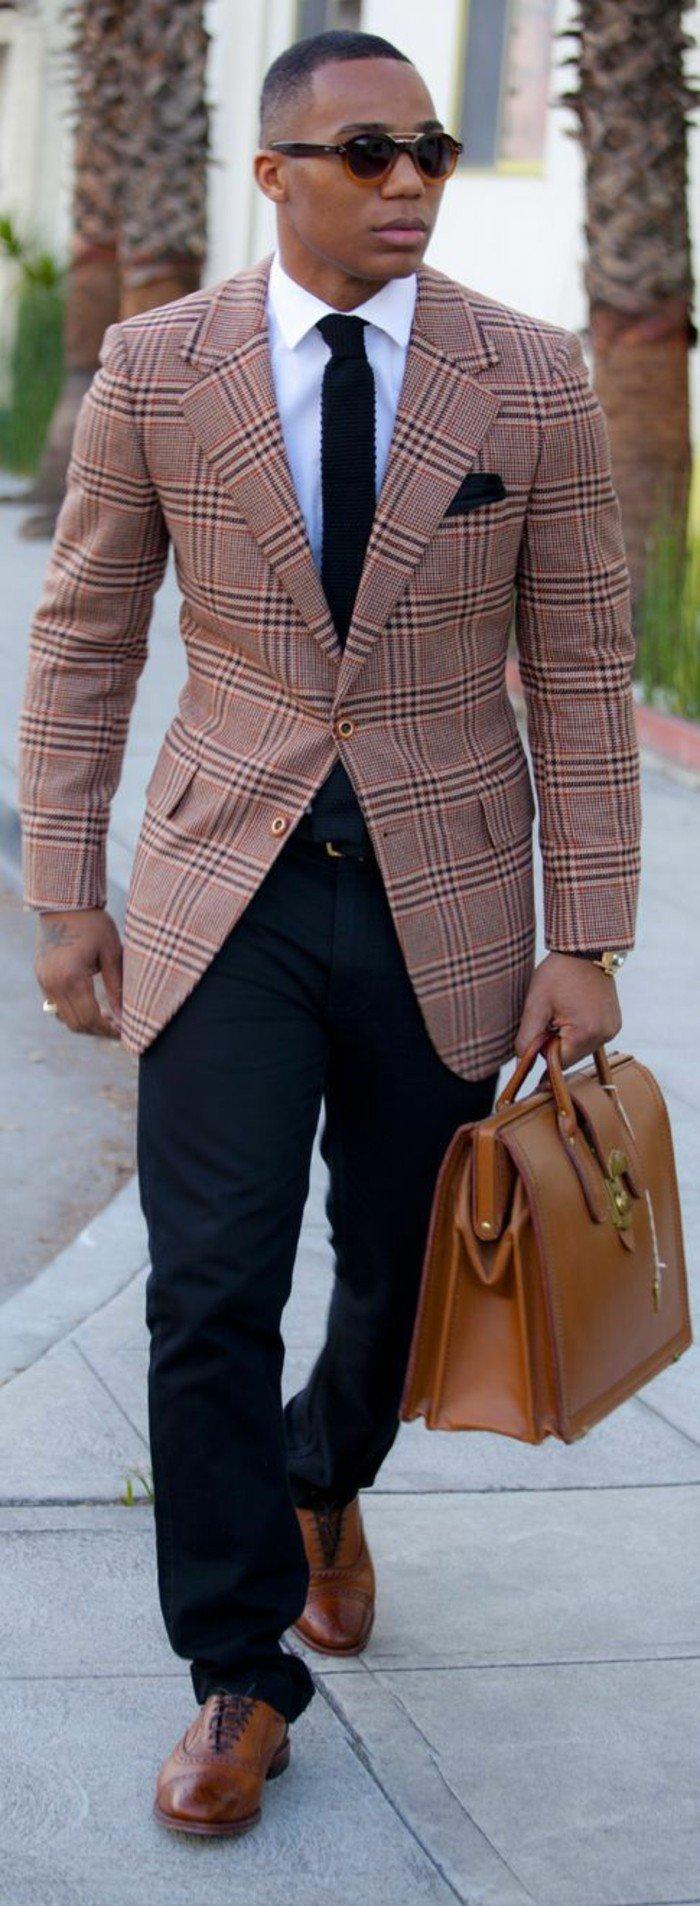 formidable-sac-homme-cuir-sacoche-longchamp-veste-carreau